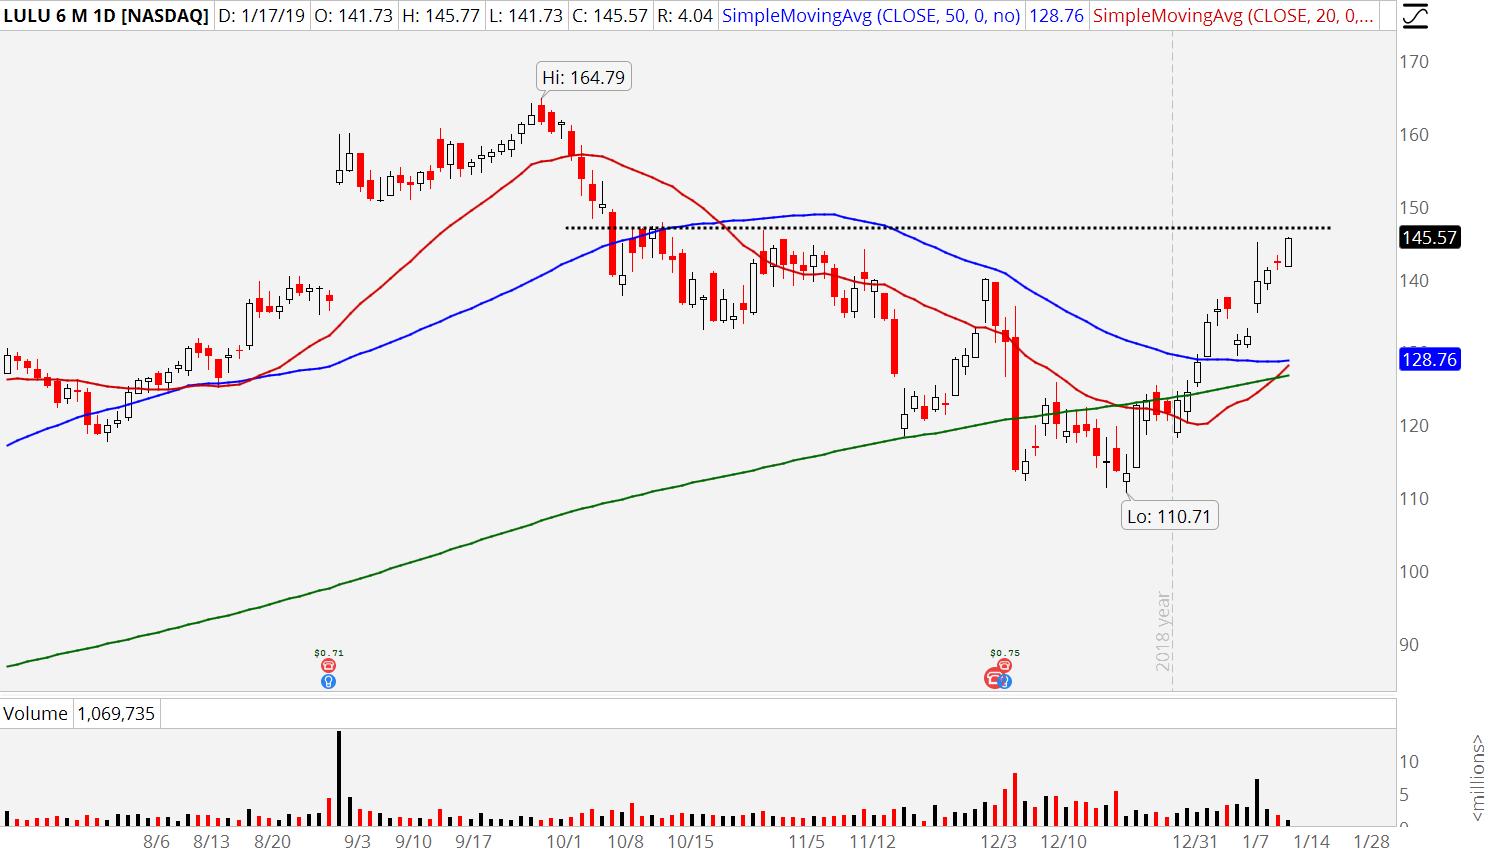 3 Retail Stocks to Buy: Lululemon Athletica (LULU)